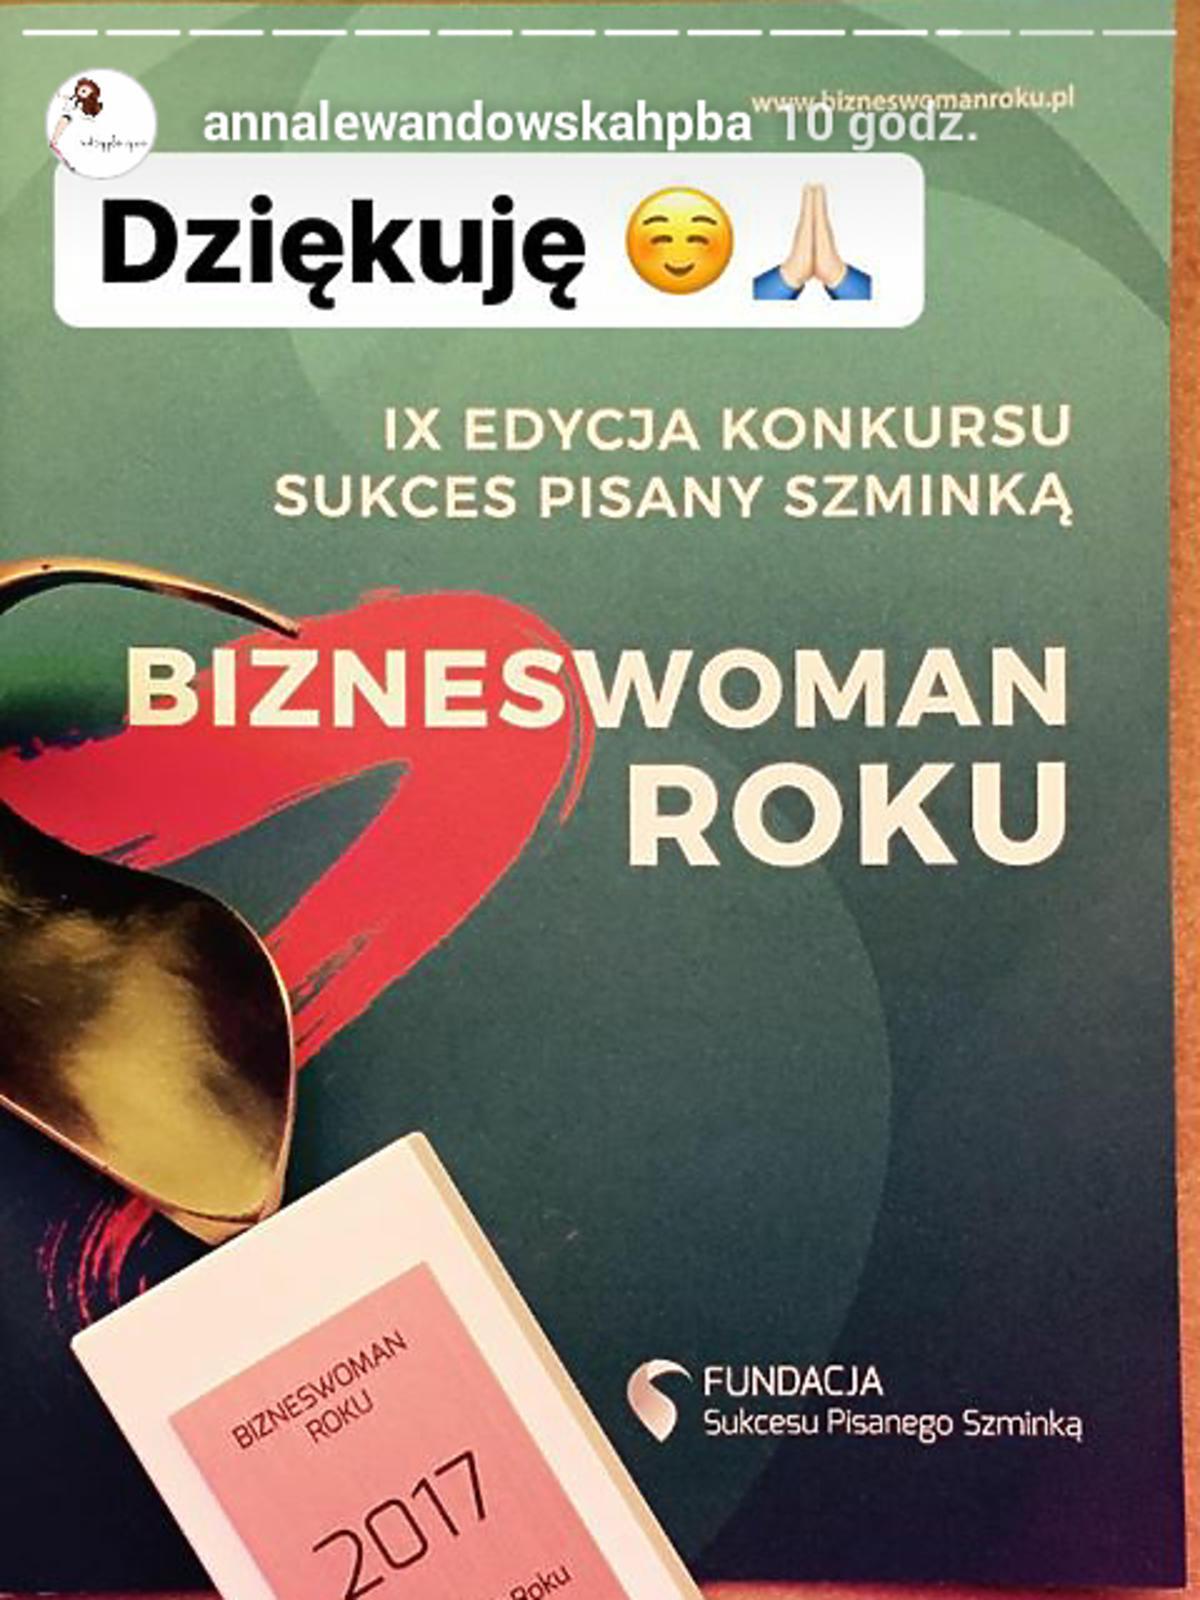 Anna Lewandowska influencerką roku 2017